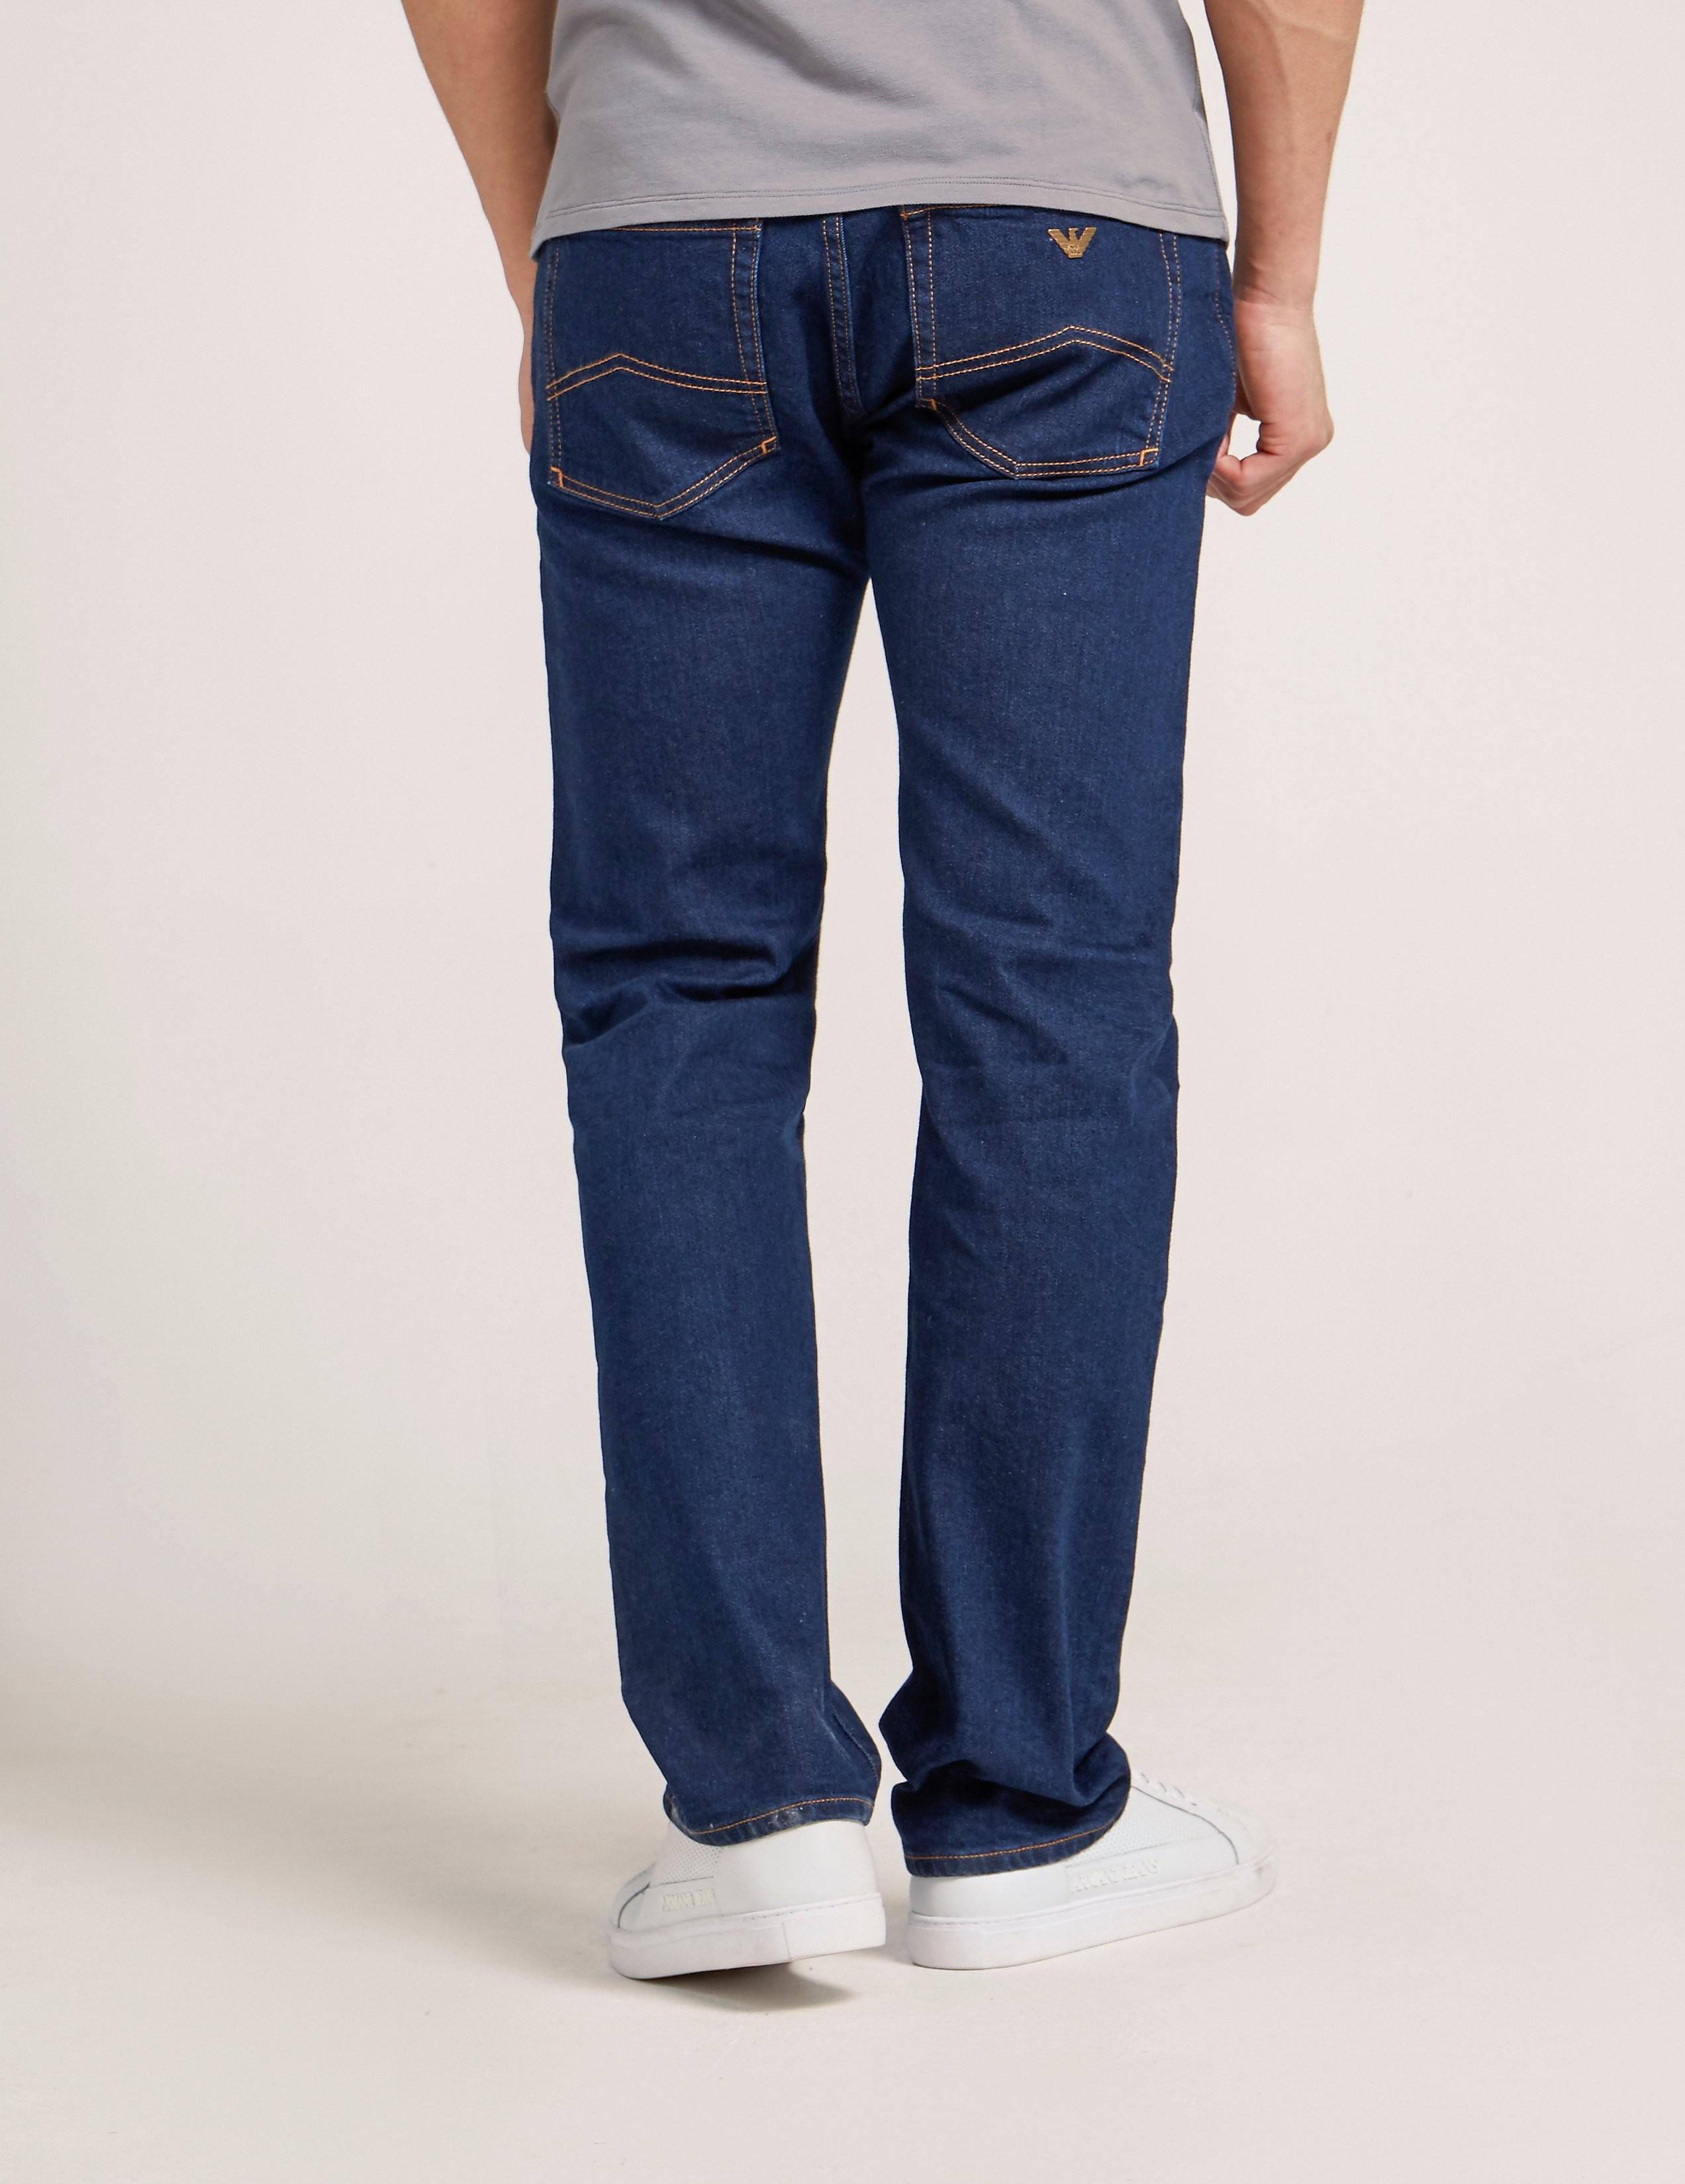 Armani Jeans J45 Jeans - Regular